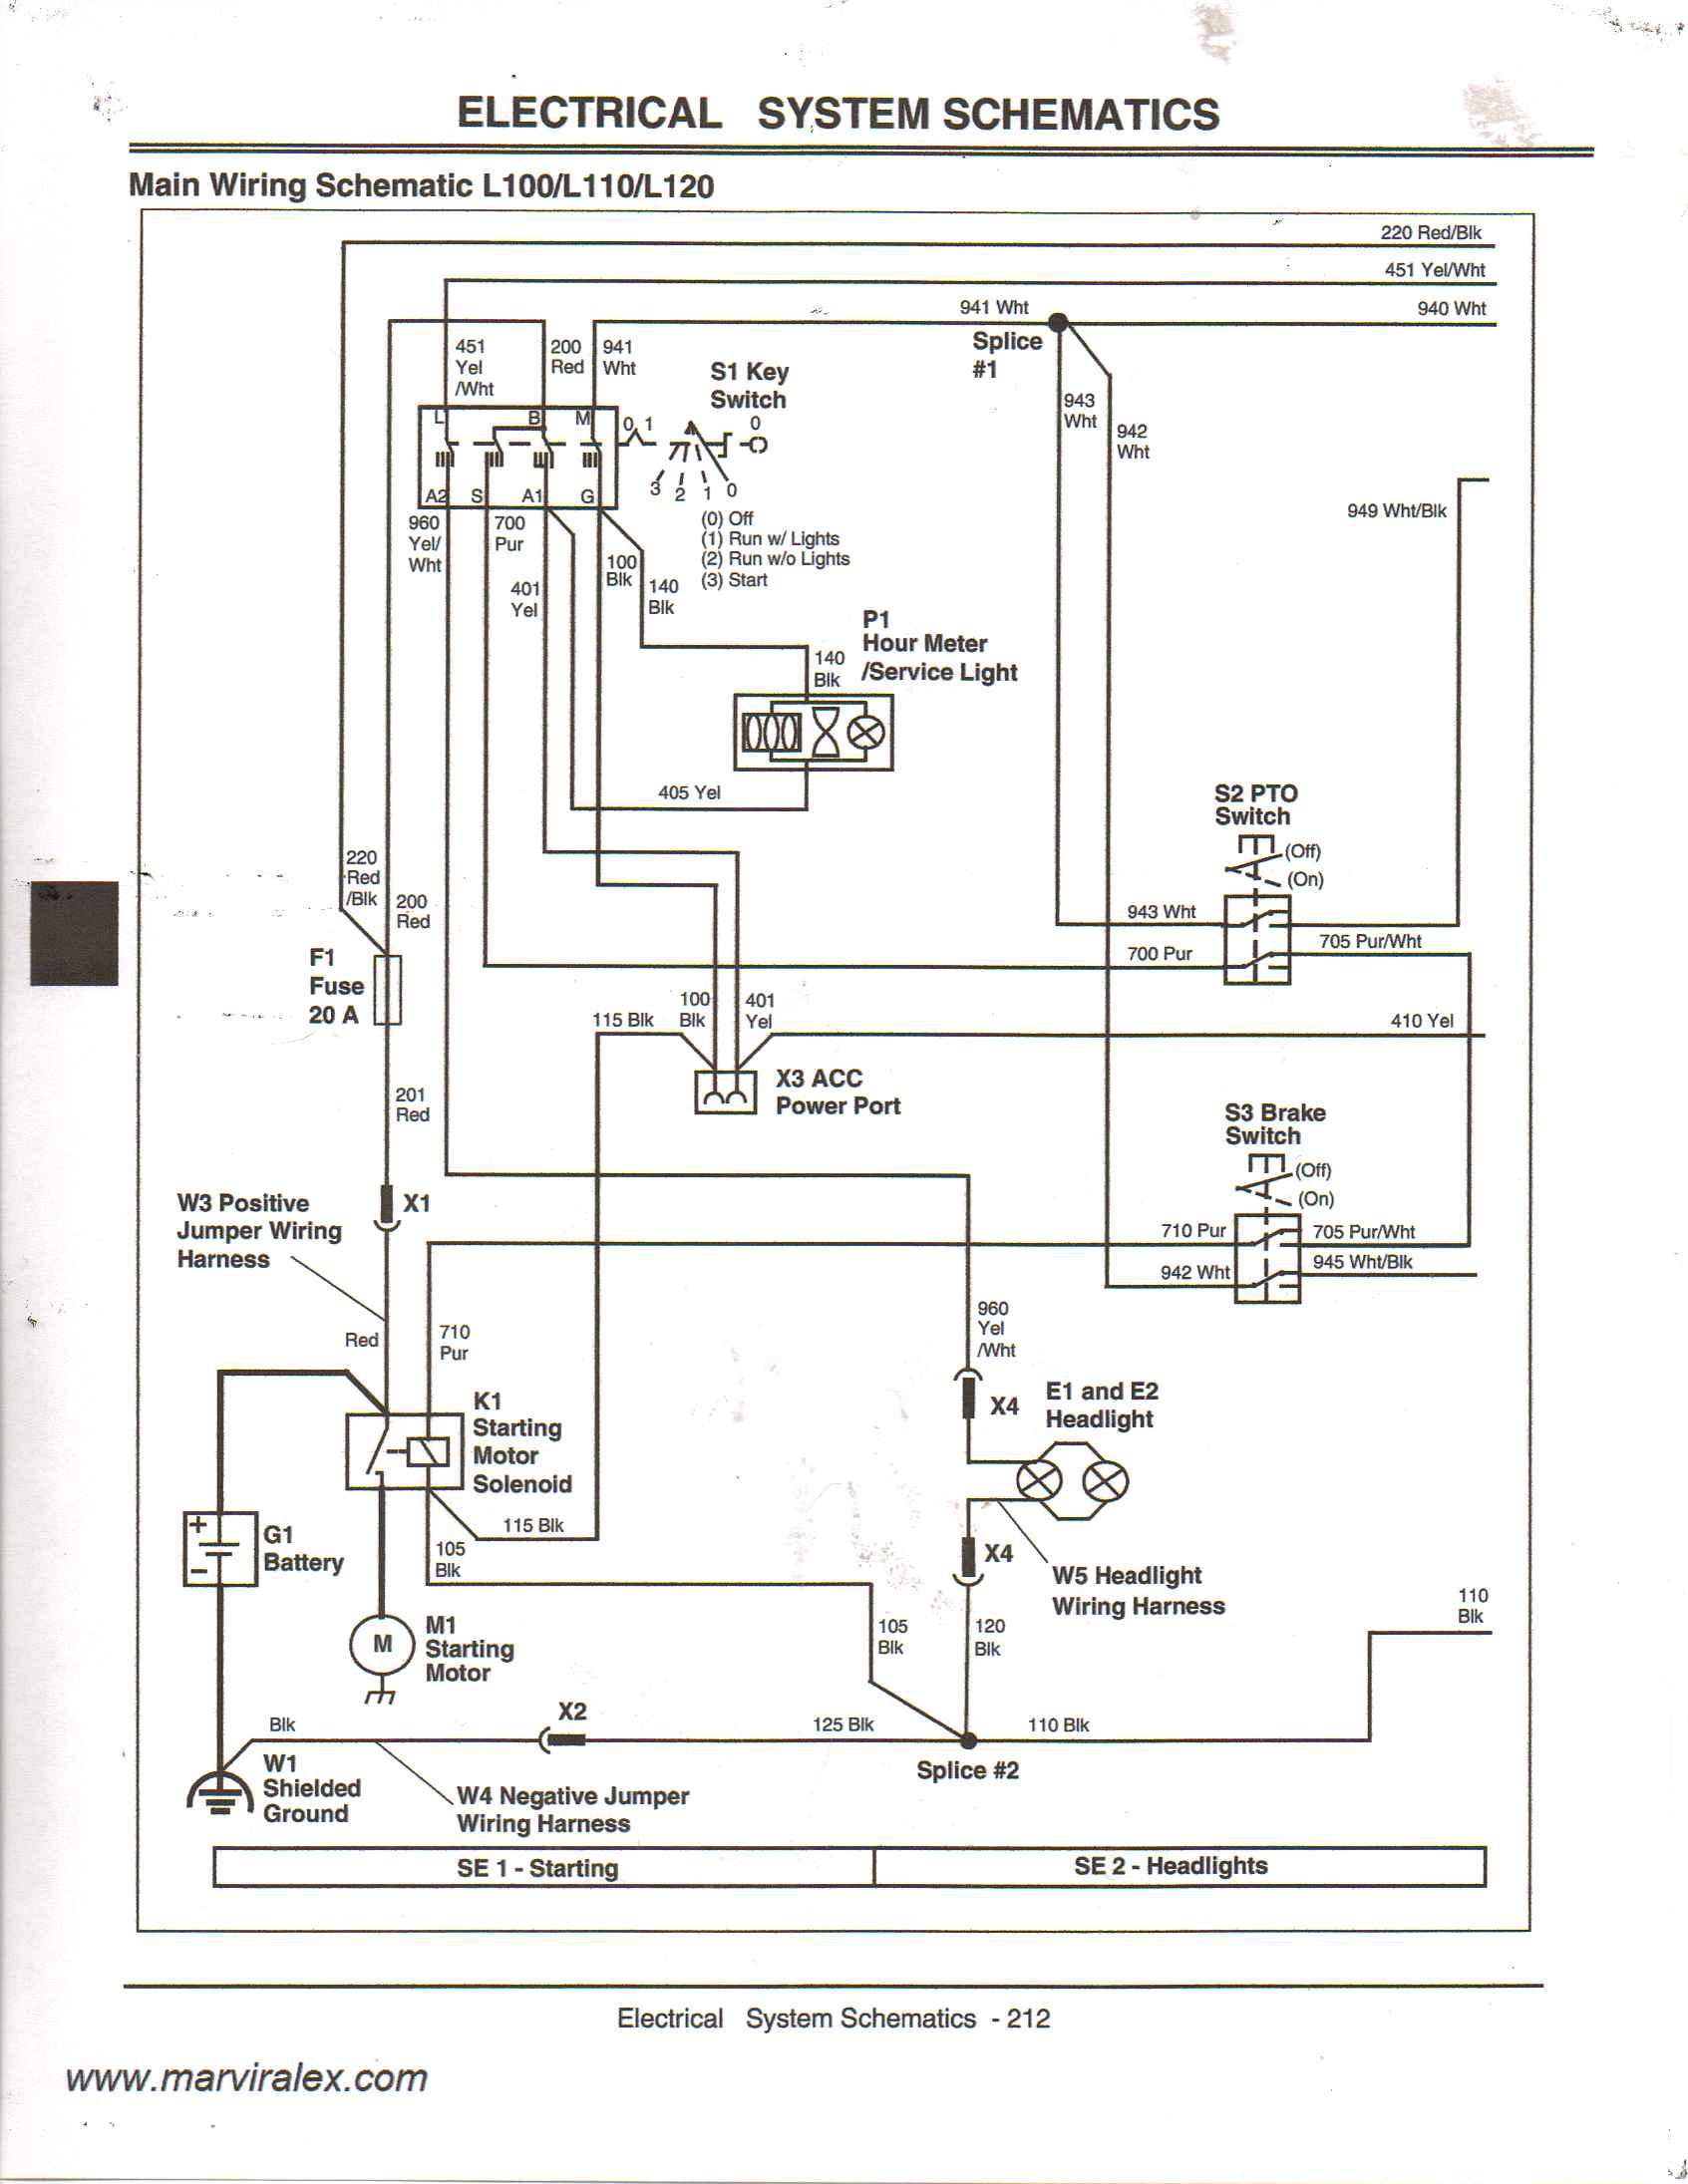 Pto Clutch John Deere L120 Wiring Diagram from diagramweb.net